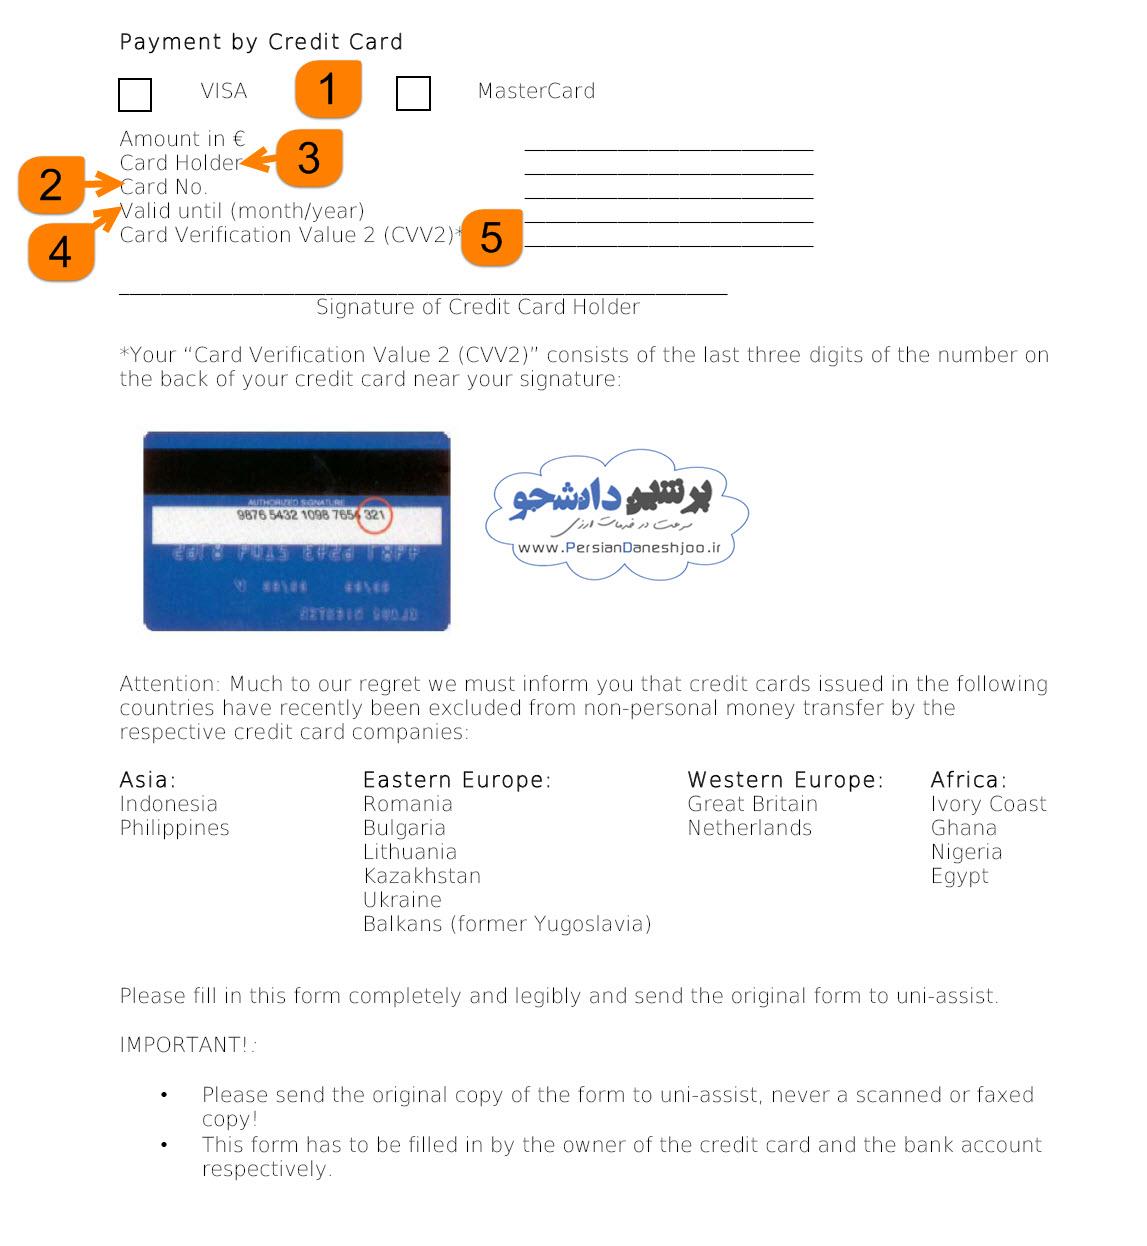 نمونه فرم پرداخت آفلاین با مستر کارت یا ویزا کارت